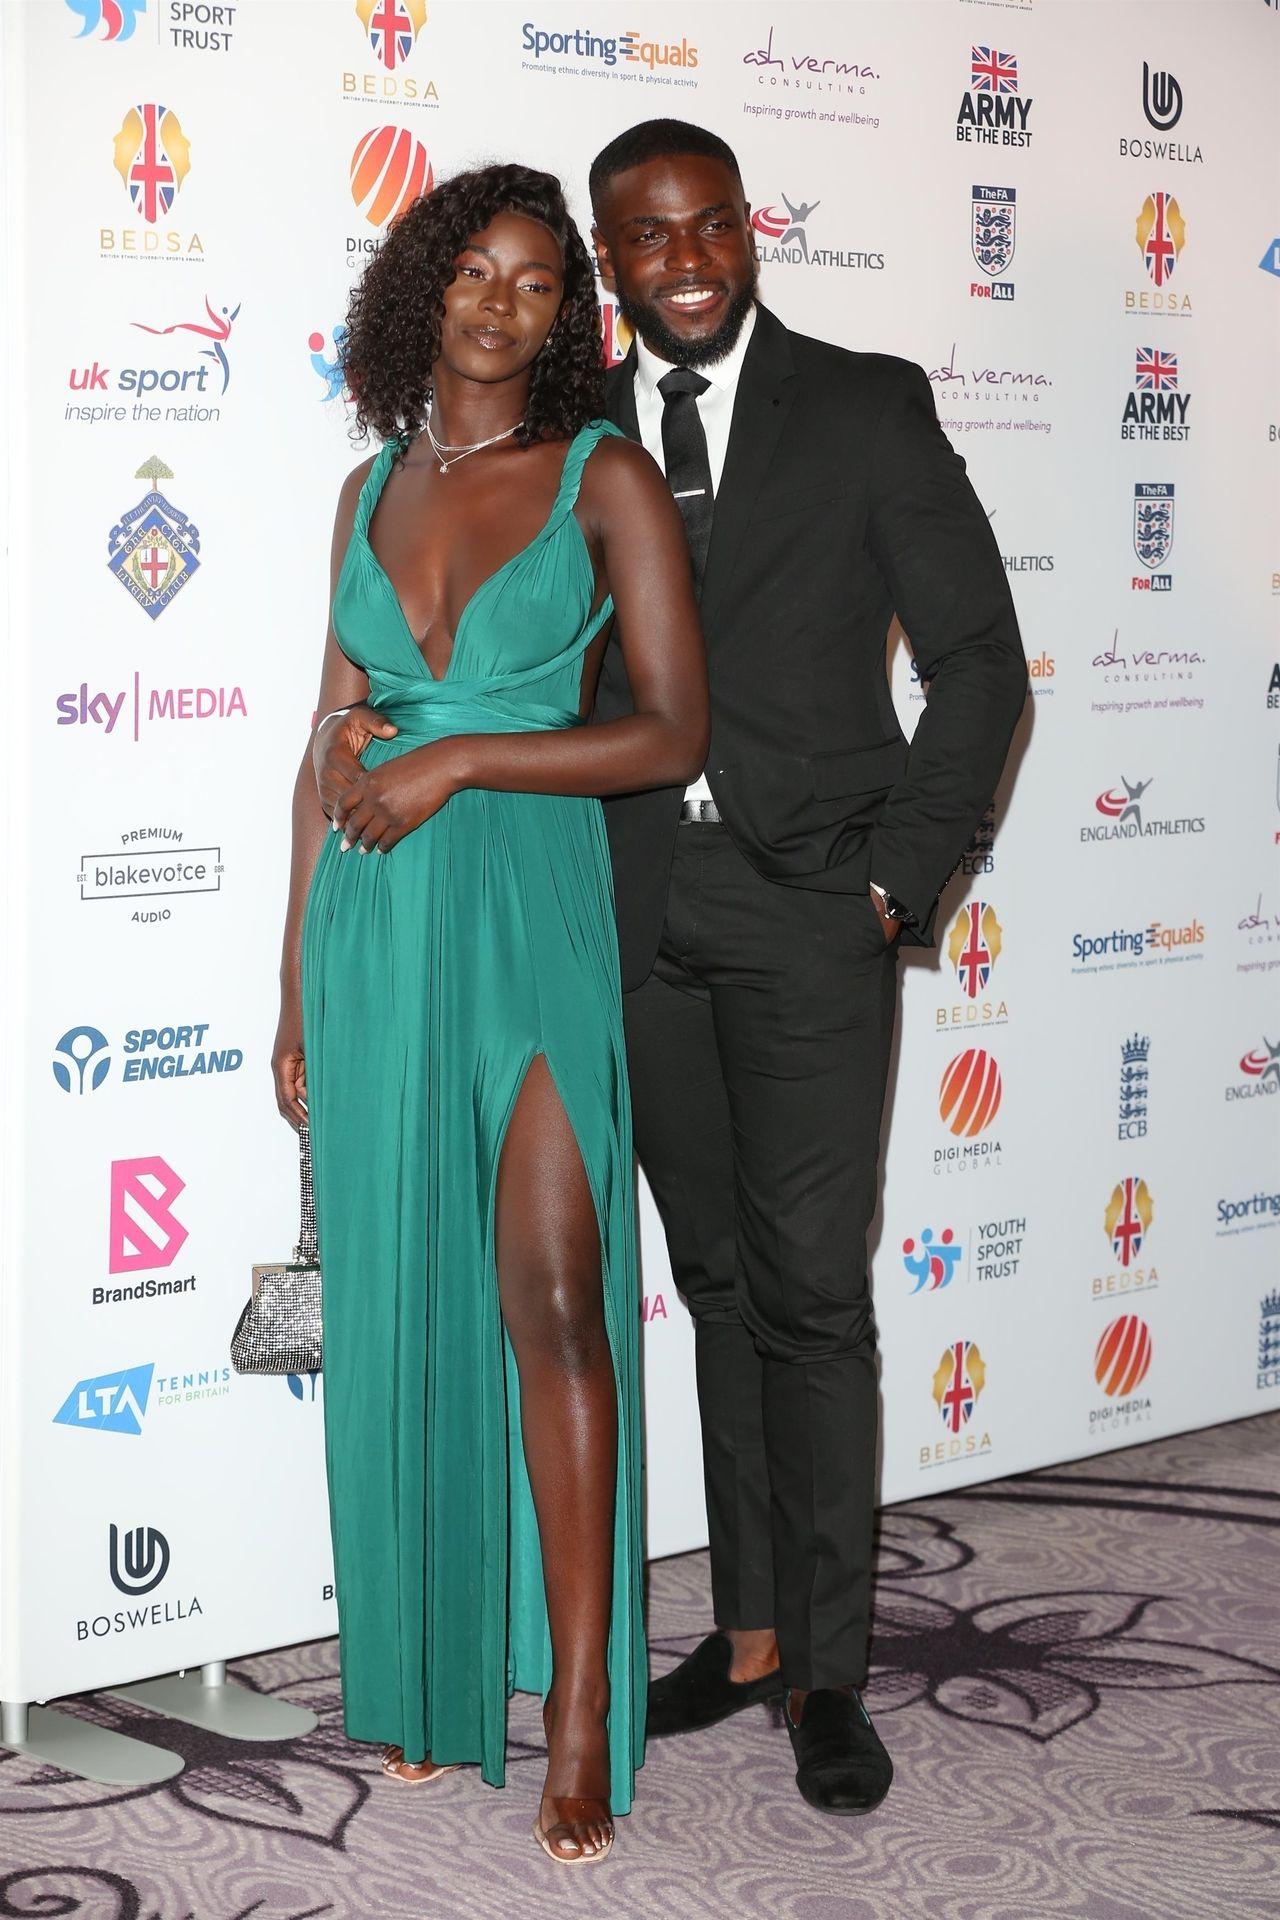 Mike Boateng & Priscilla Anyabu Are Seen At British Ethnic Diversity Sports Awards 0042